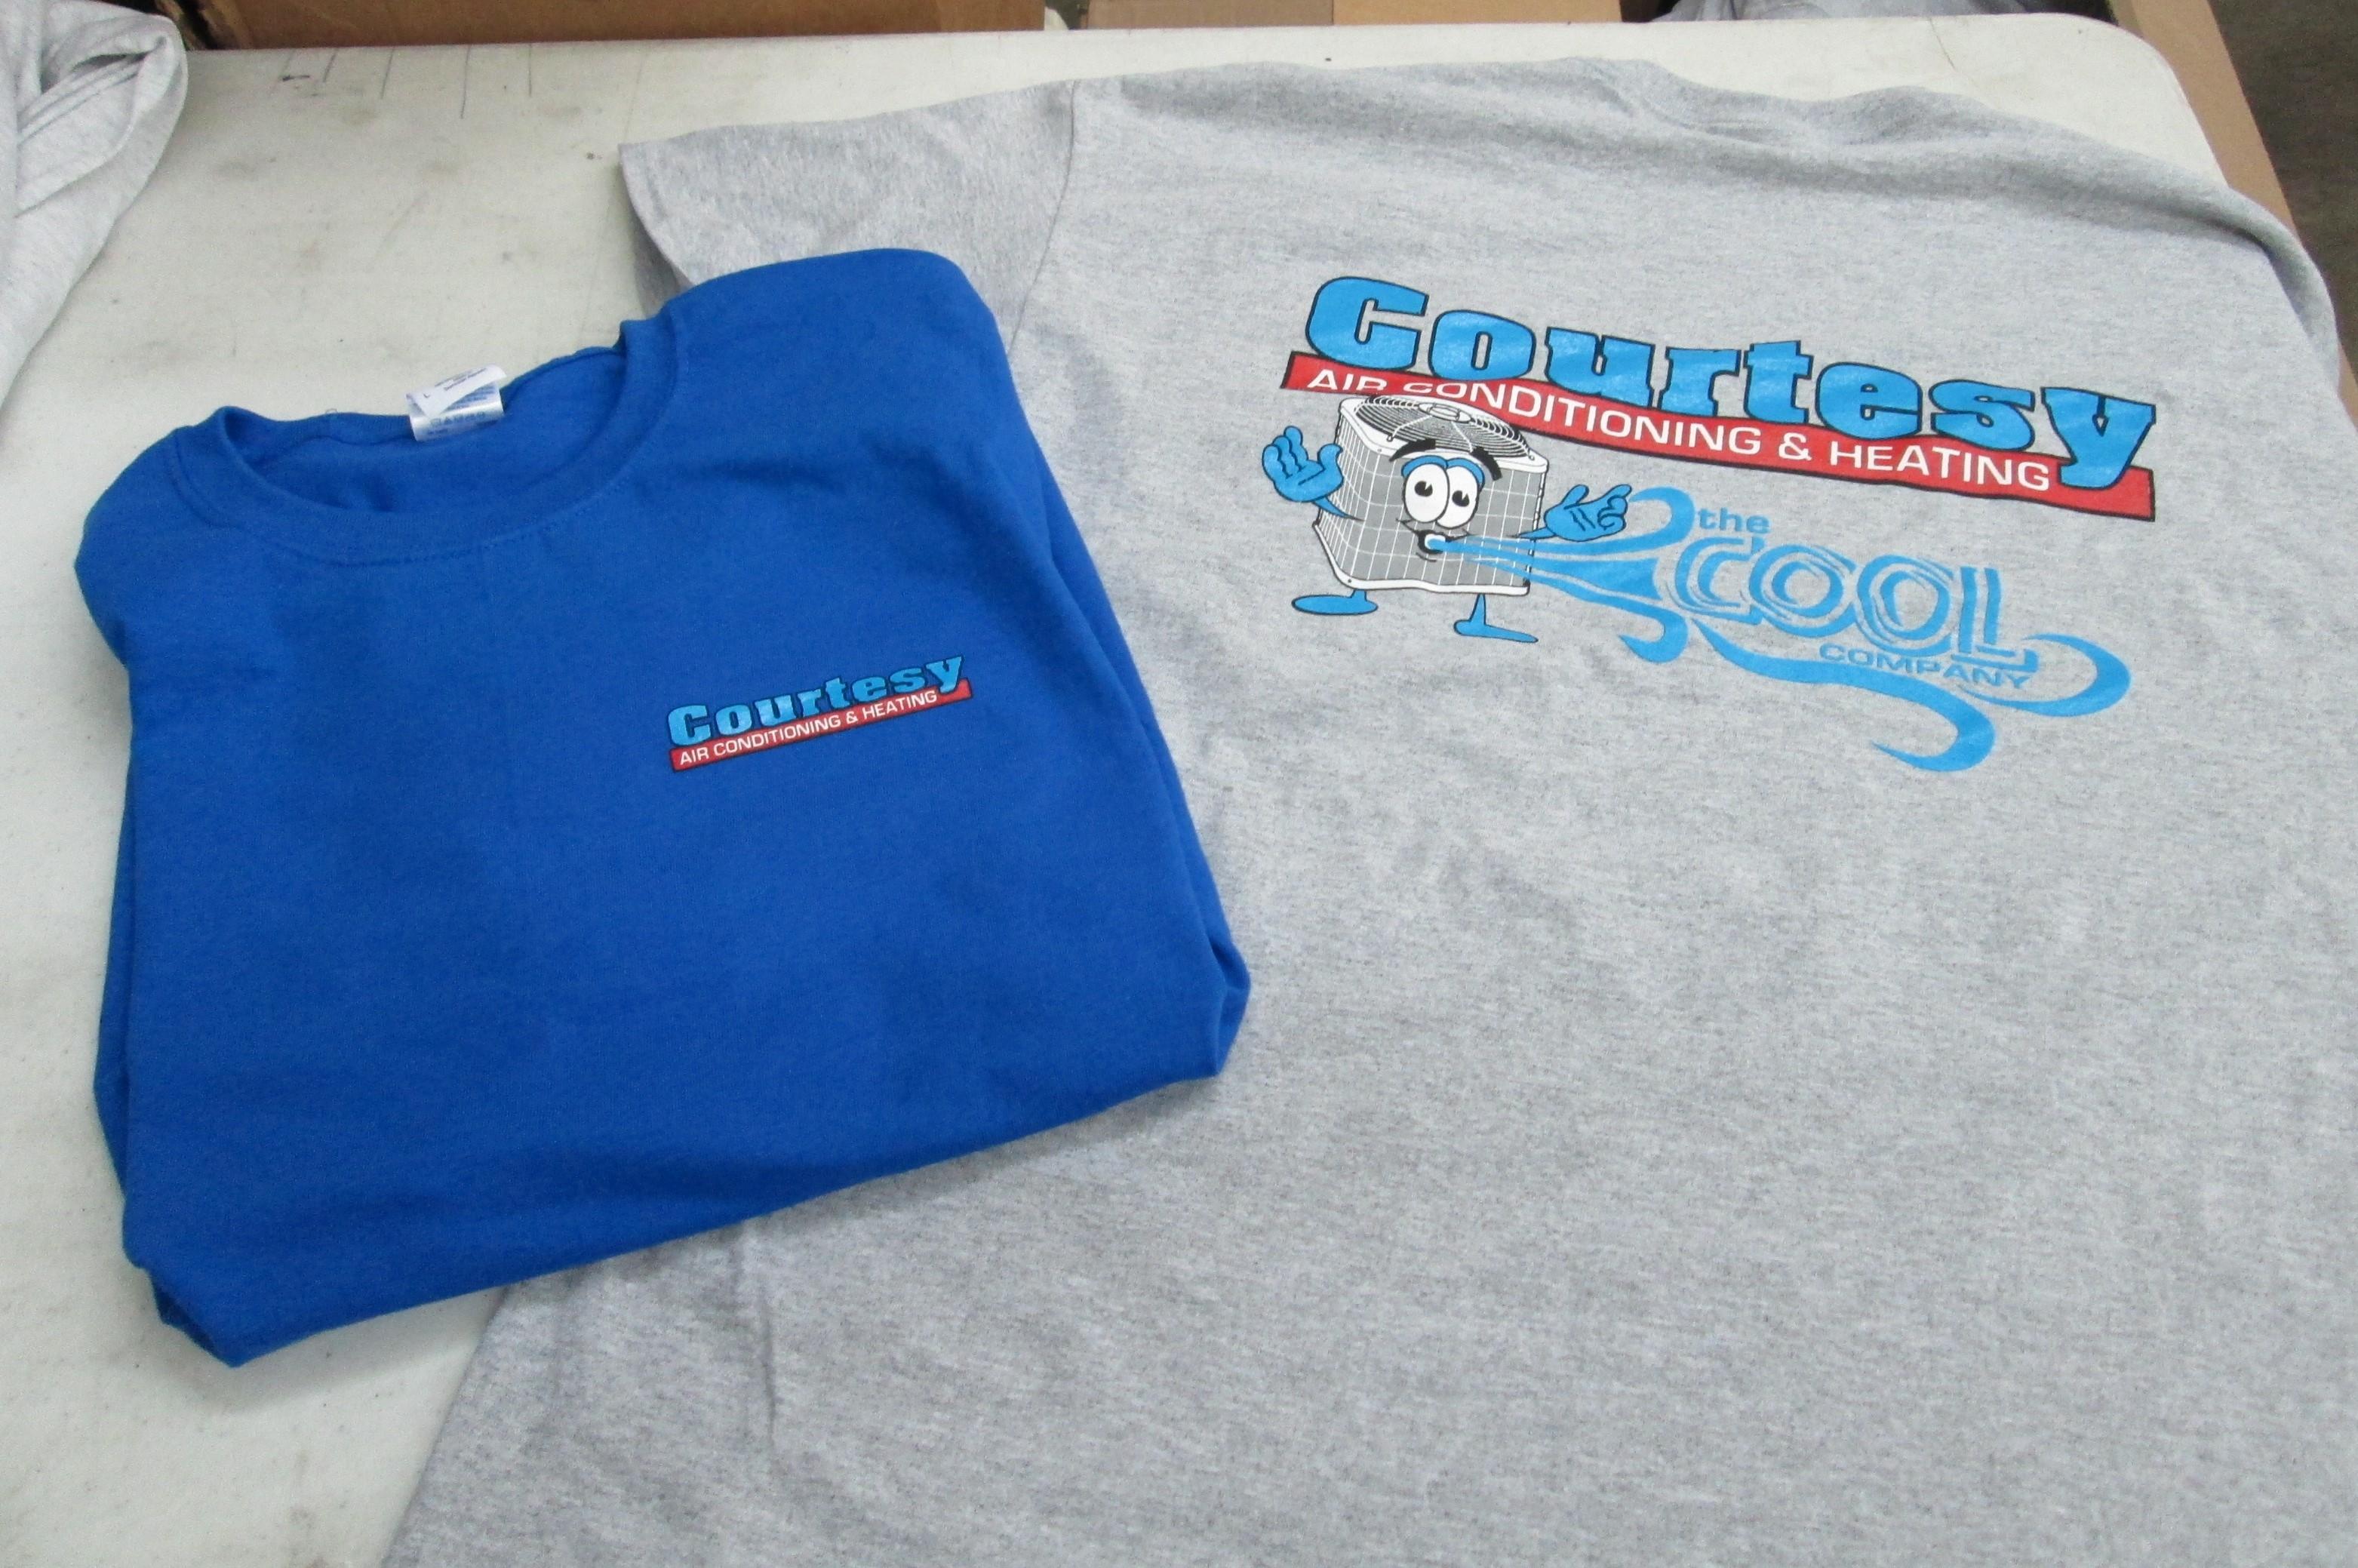 Fast trac designs vehicle wraps screen printing for T shirt printing chandler az